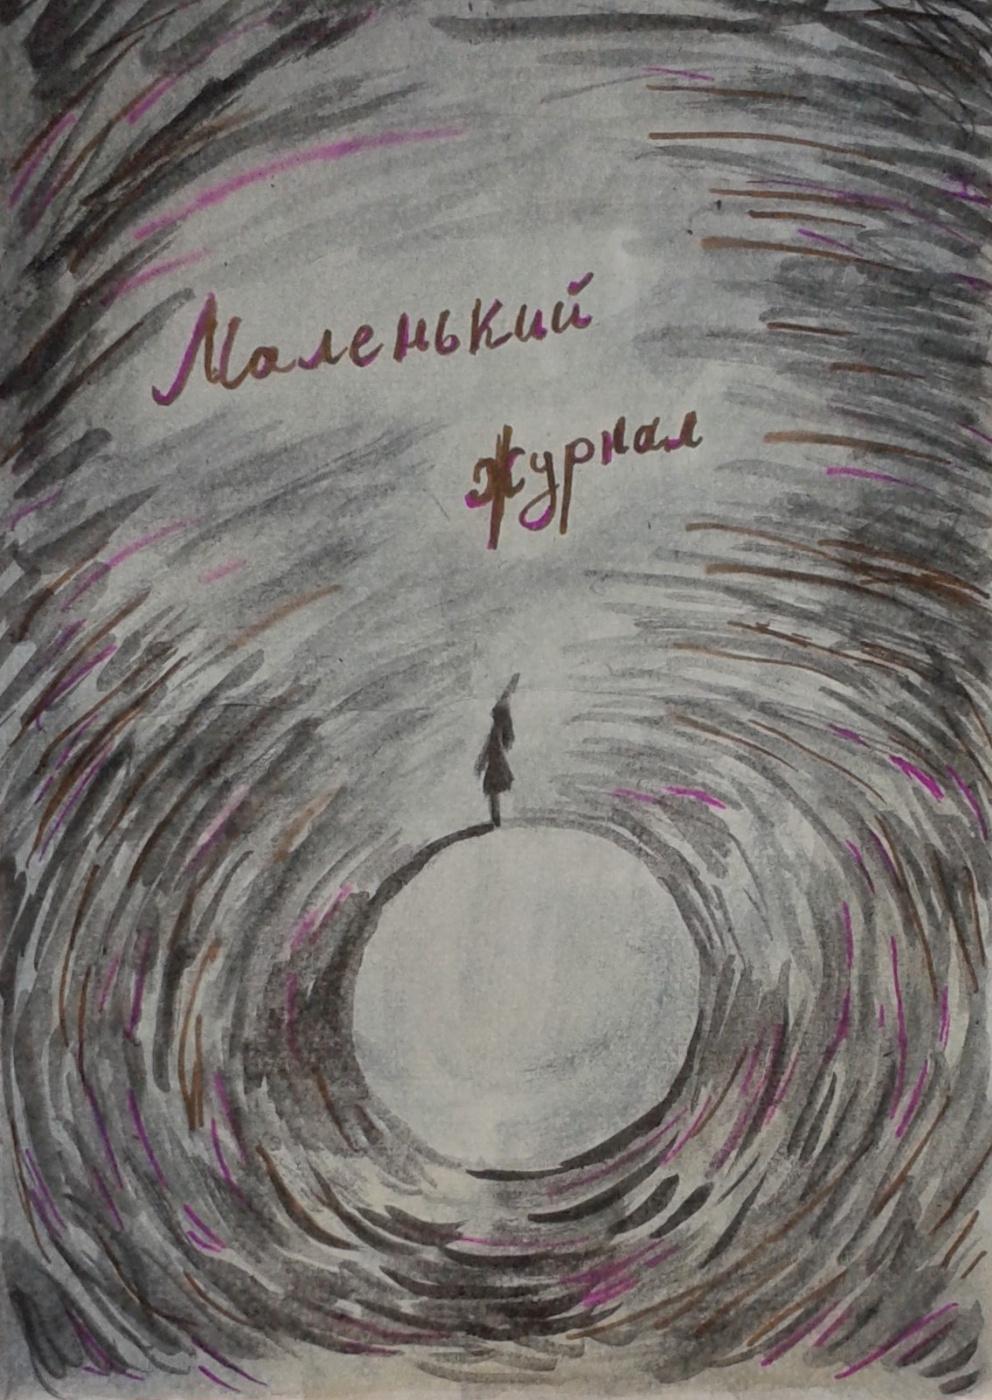 Zina Vladimirovna Parisva. Little magazine. Cover